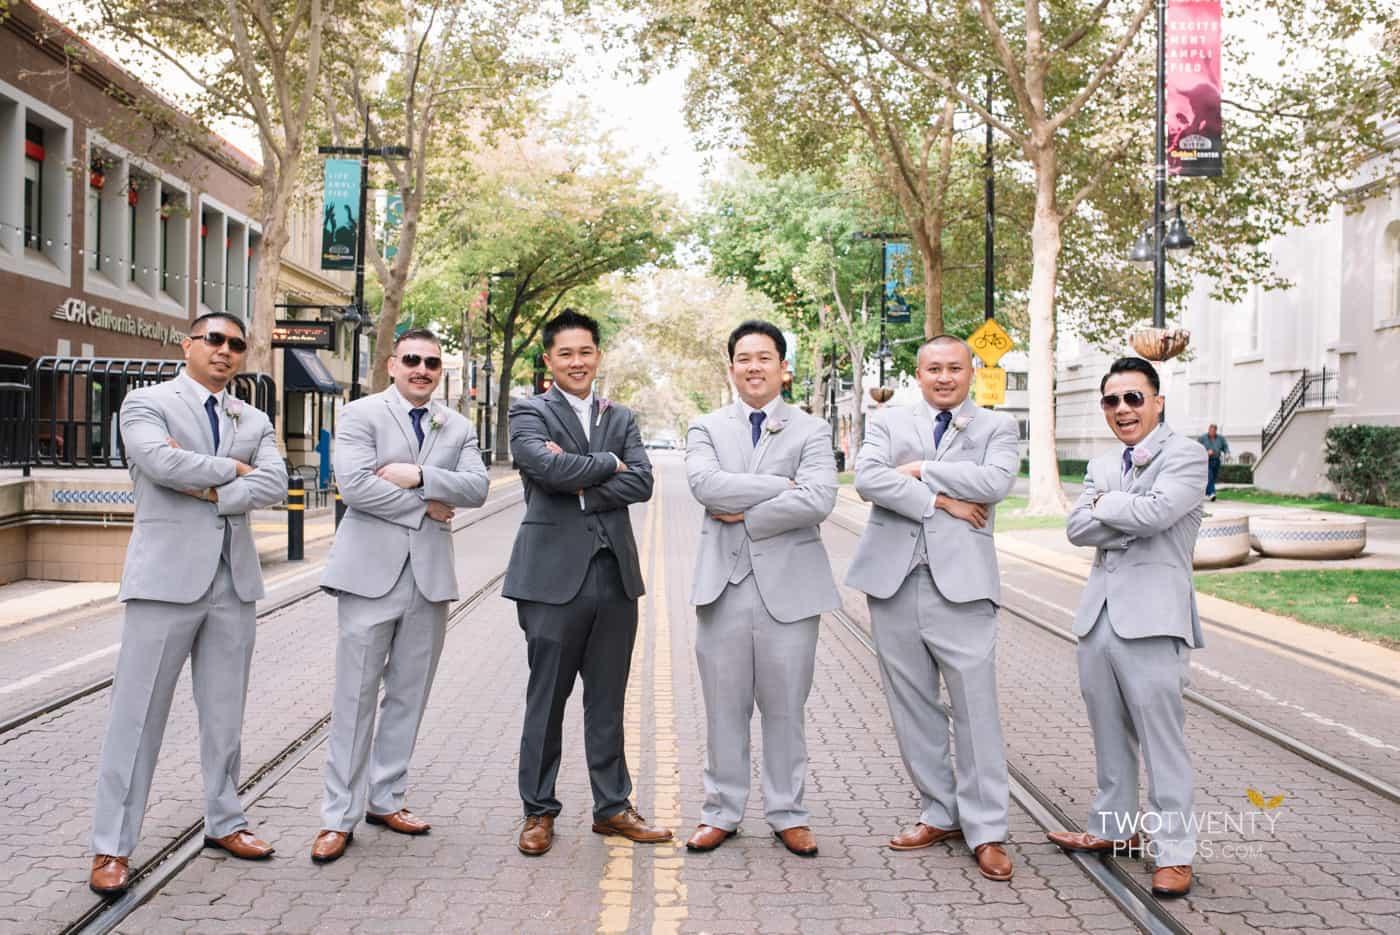 hyatt-regency-downtown-sacramento-wedding-photographer-31